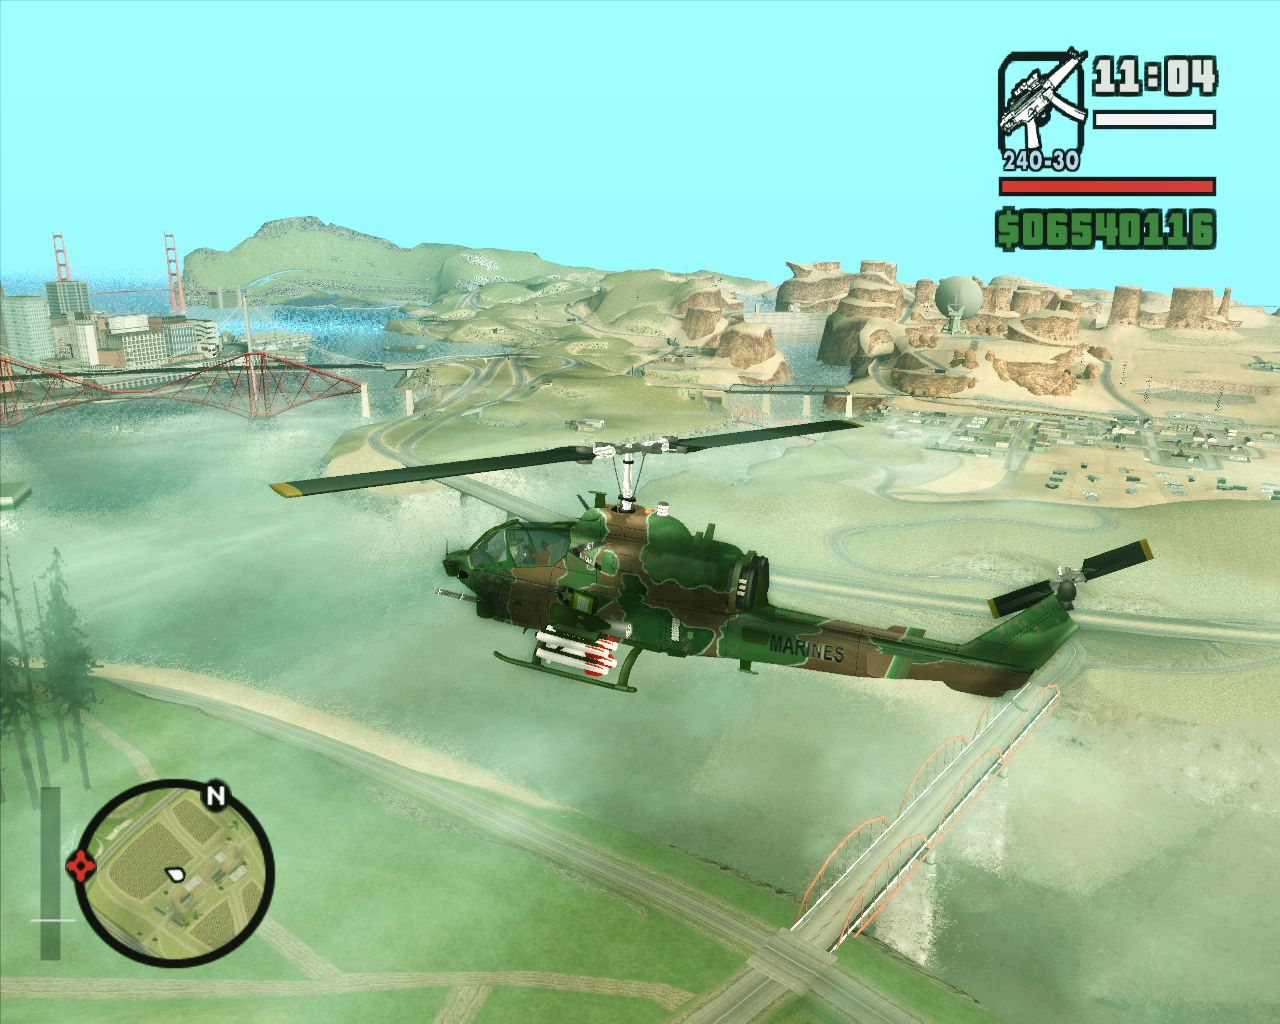 gta_sa 2008-04-13 18-41-25-04.jpg - Grand Theft Auto: San Andreas